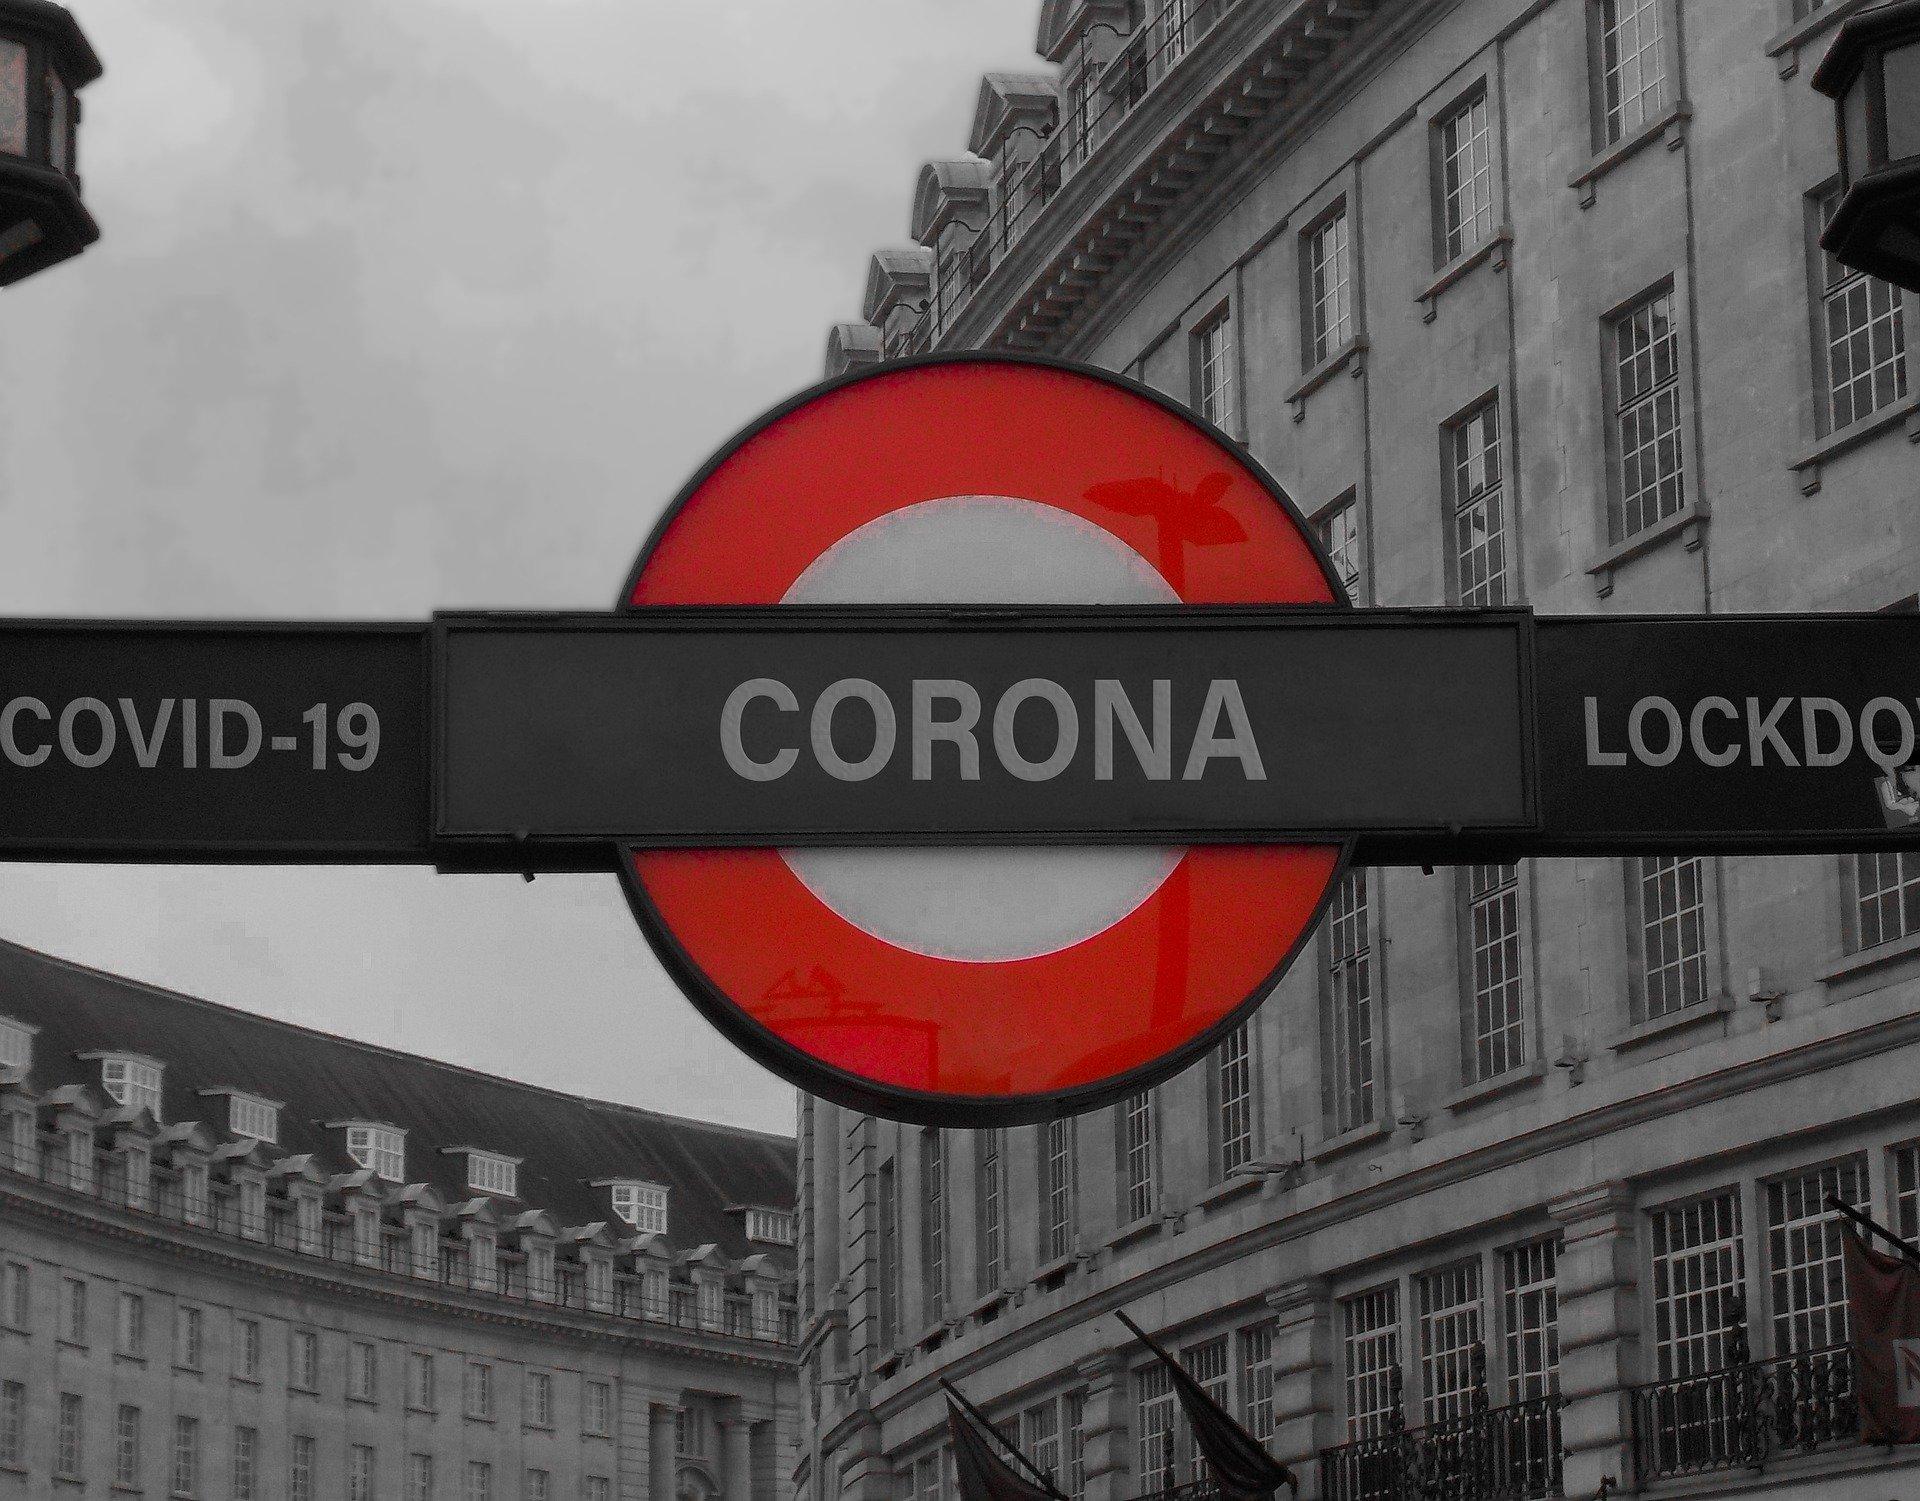 Sperrung Insel Corona Coronavirus Fehmarn Ferienwohnungen Hass